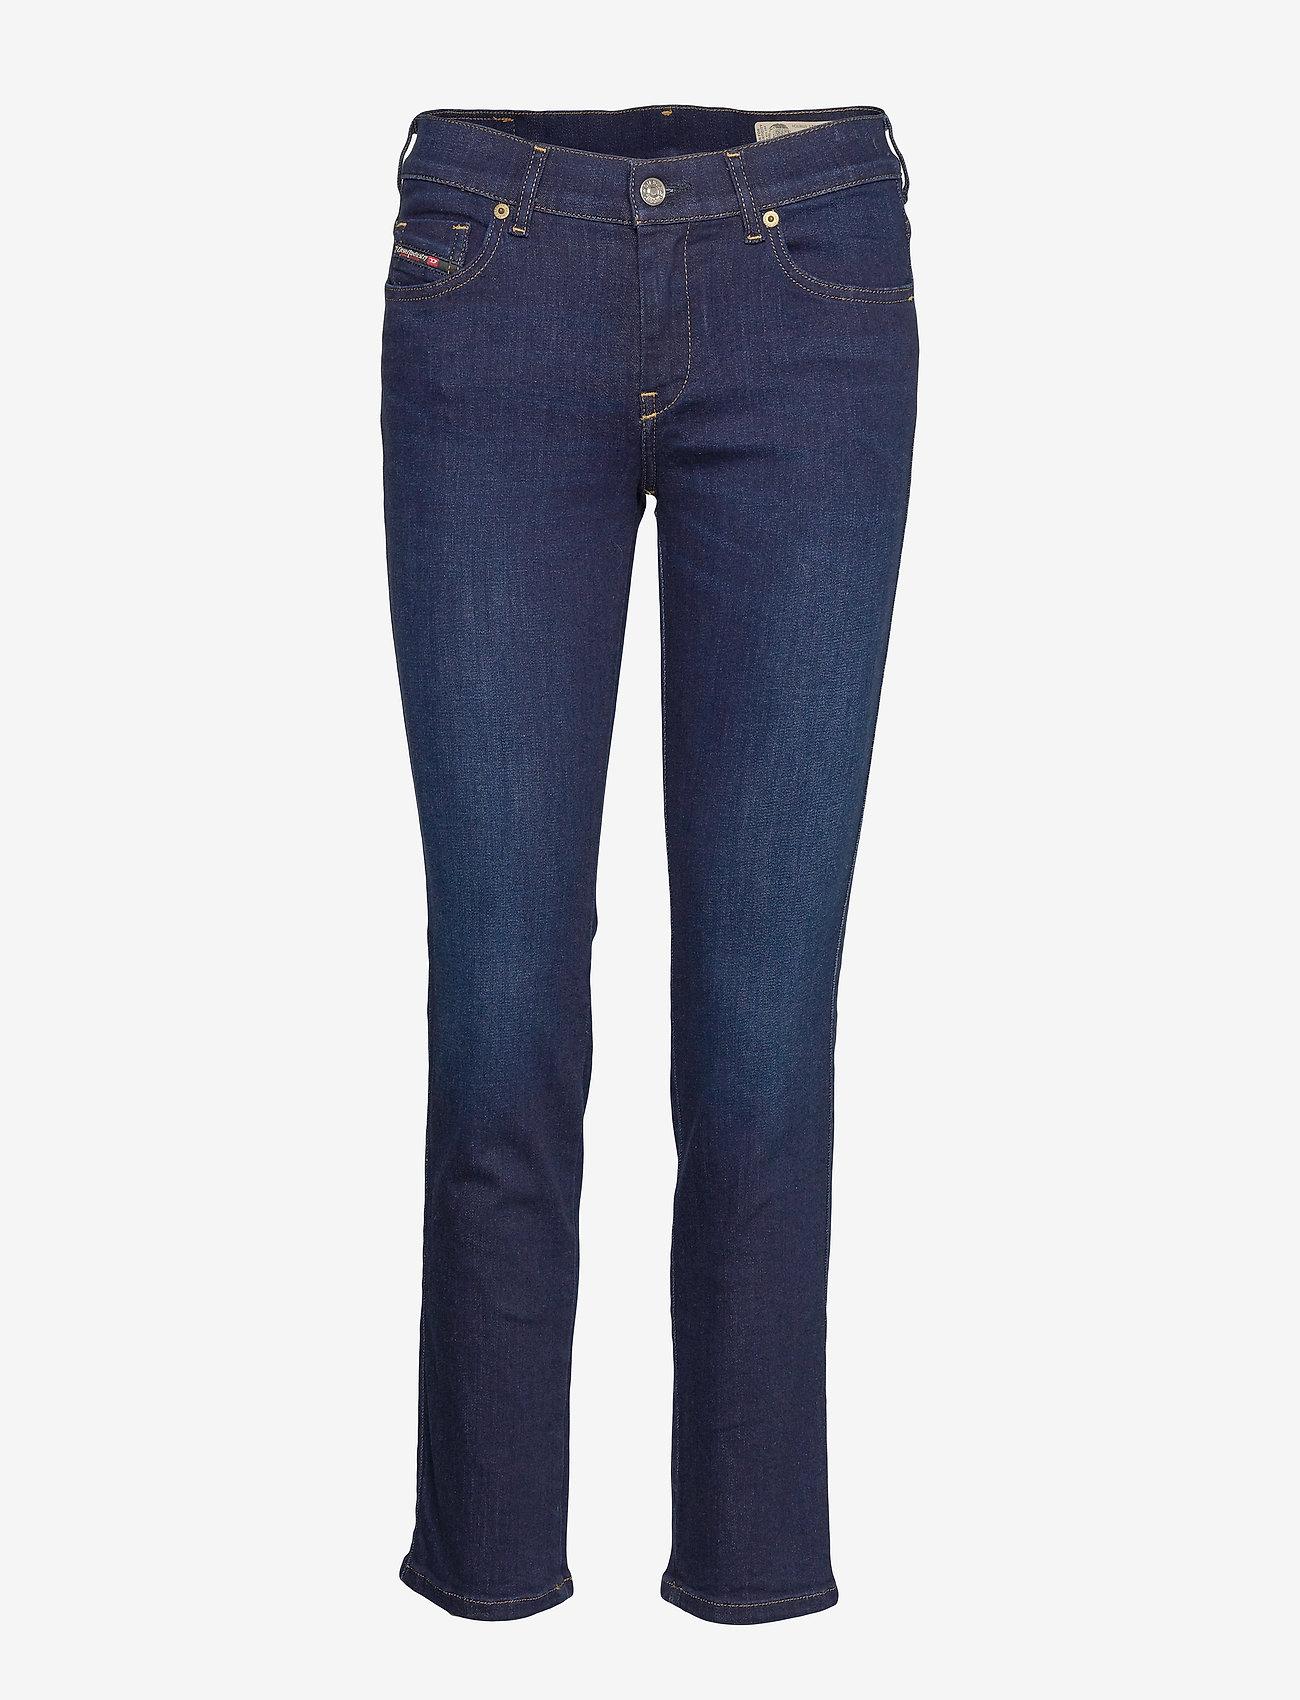 Diesel Women - D-SANDY L.30 TROUSERS - slim jeans - denim - 0